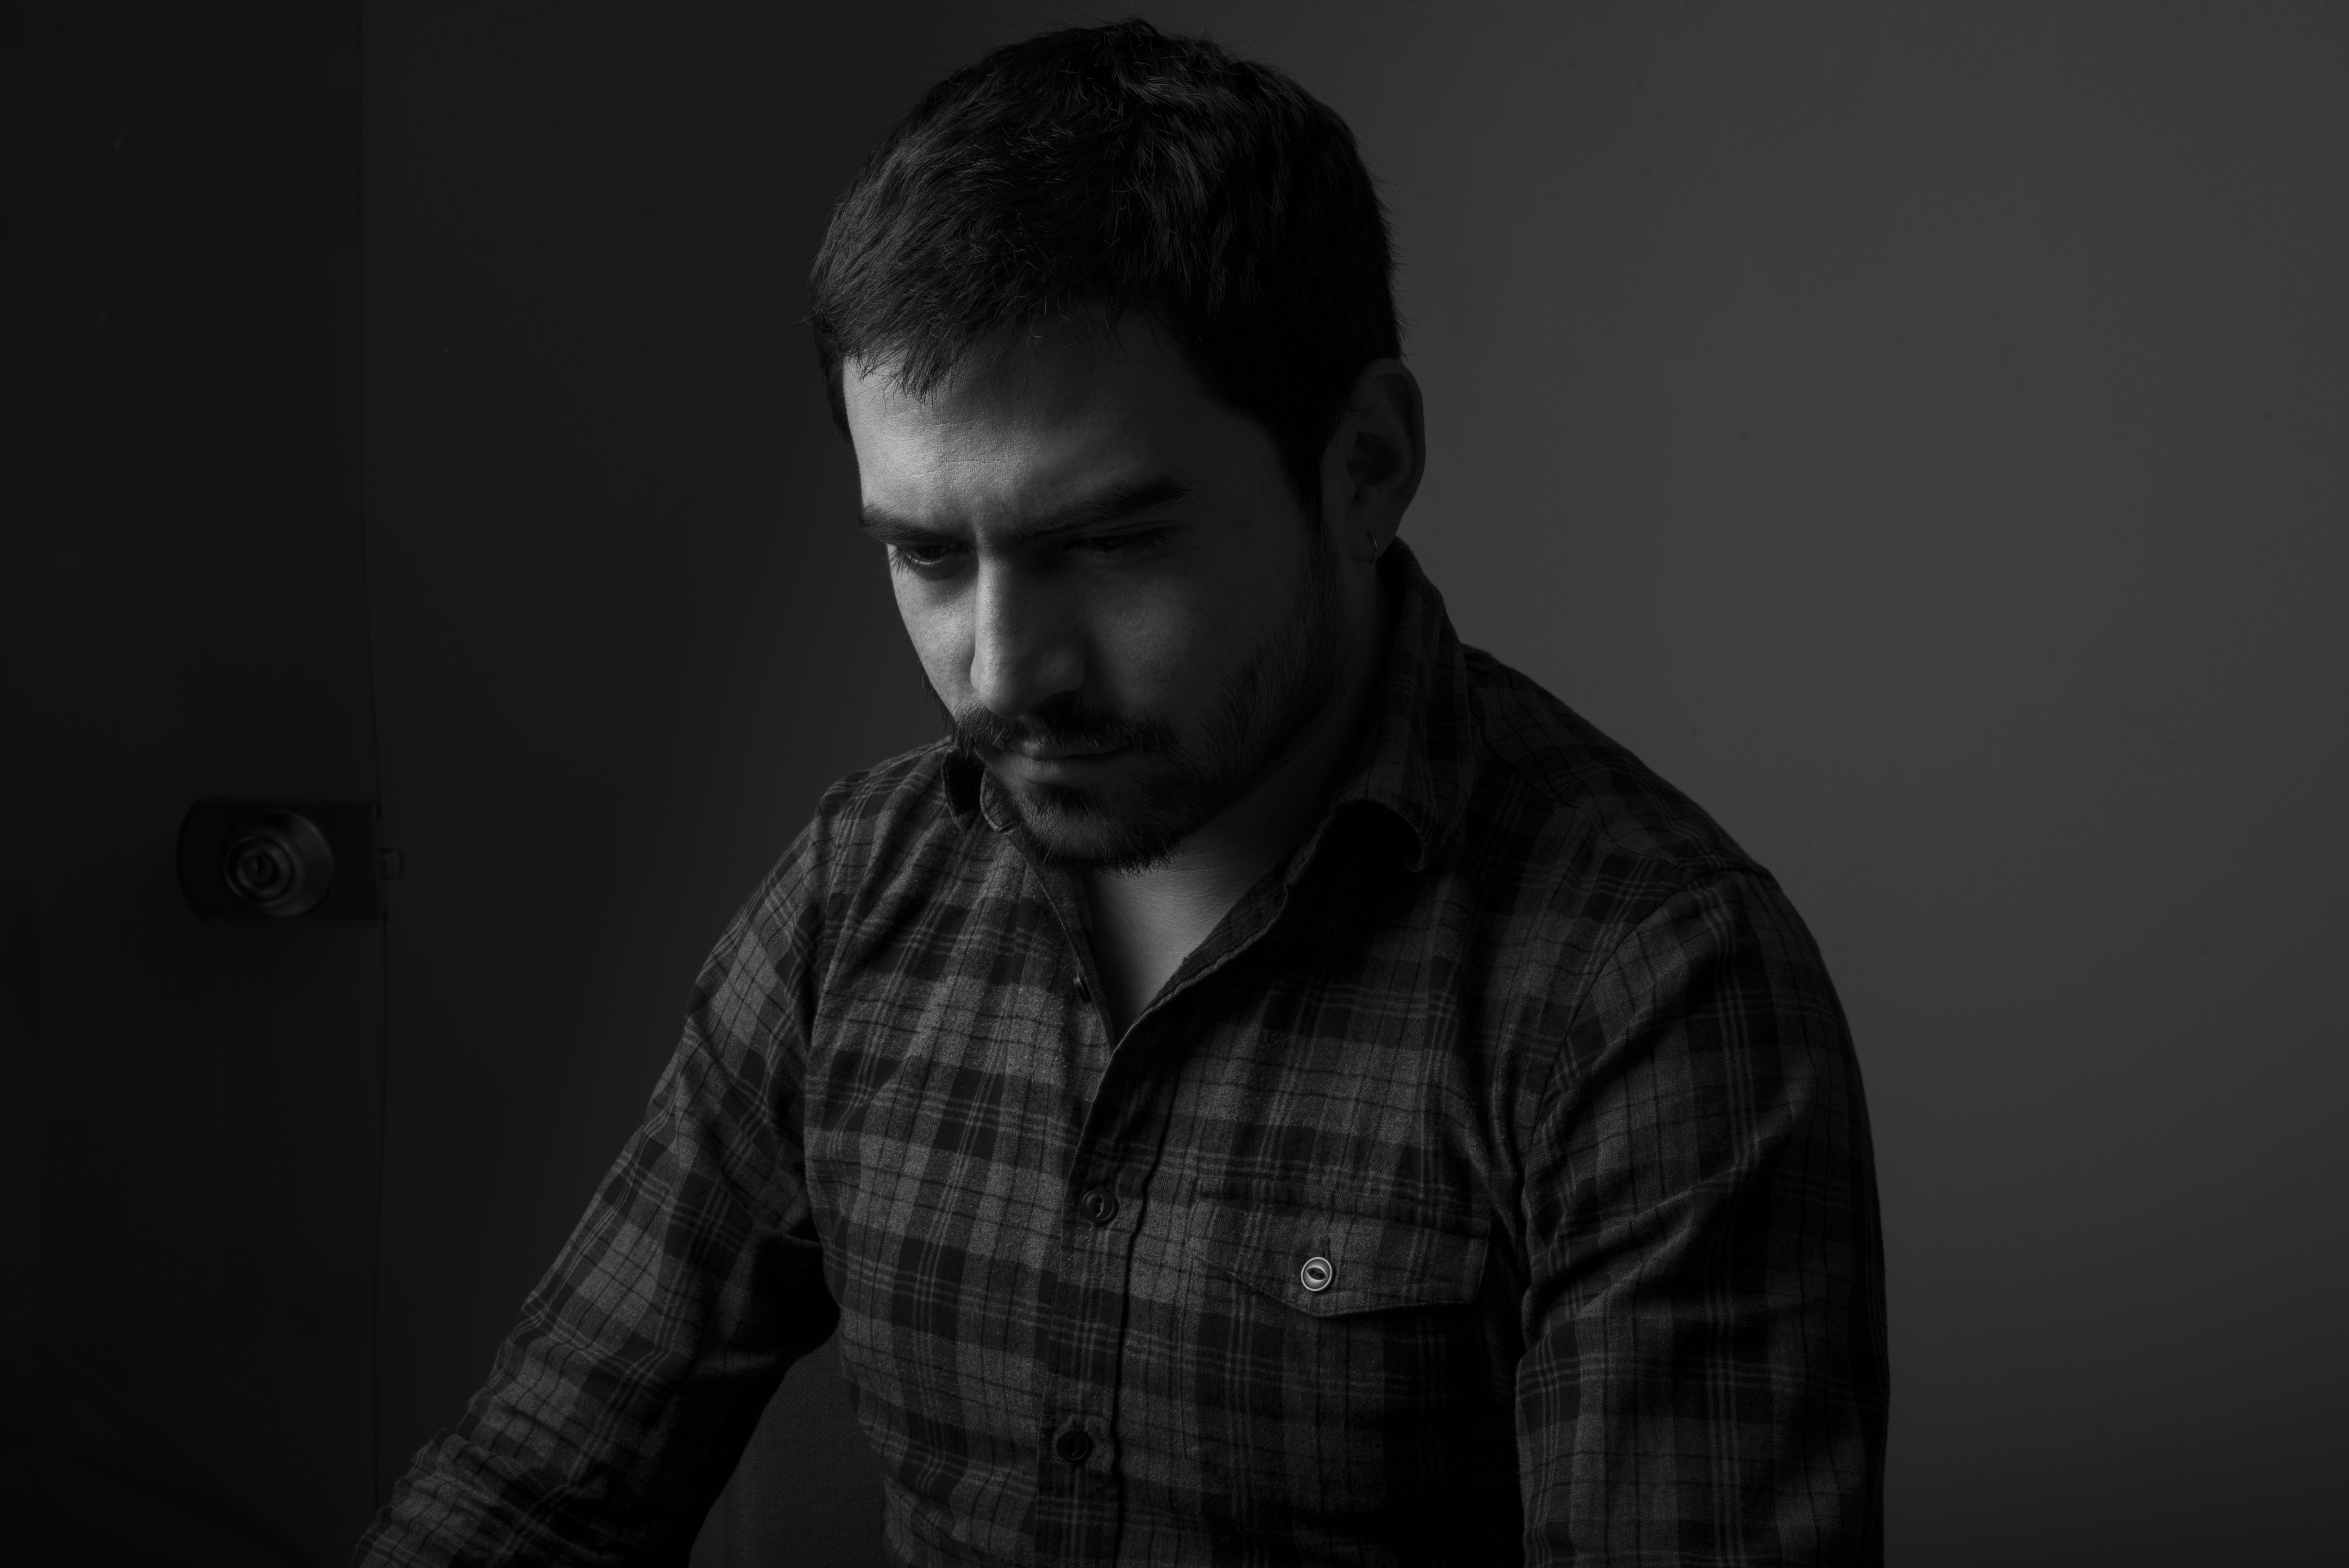 Pedro Michelena